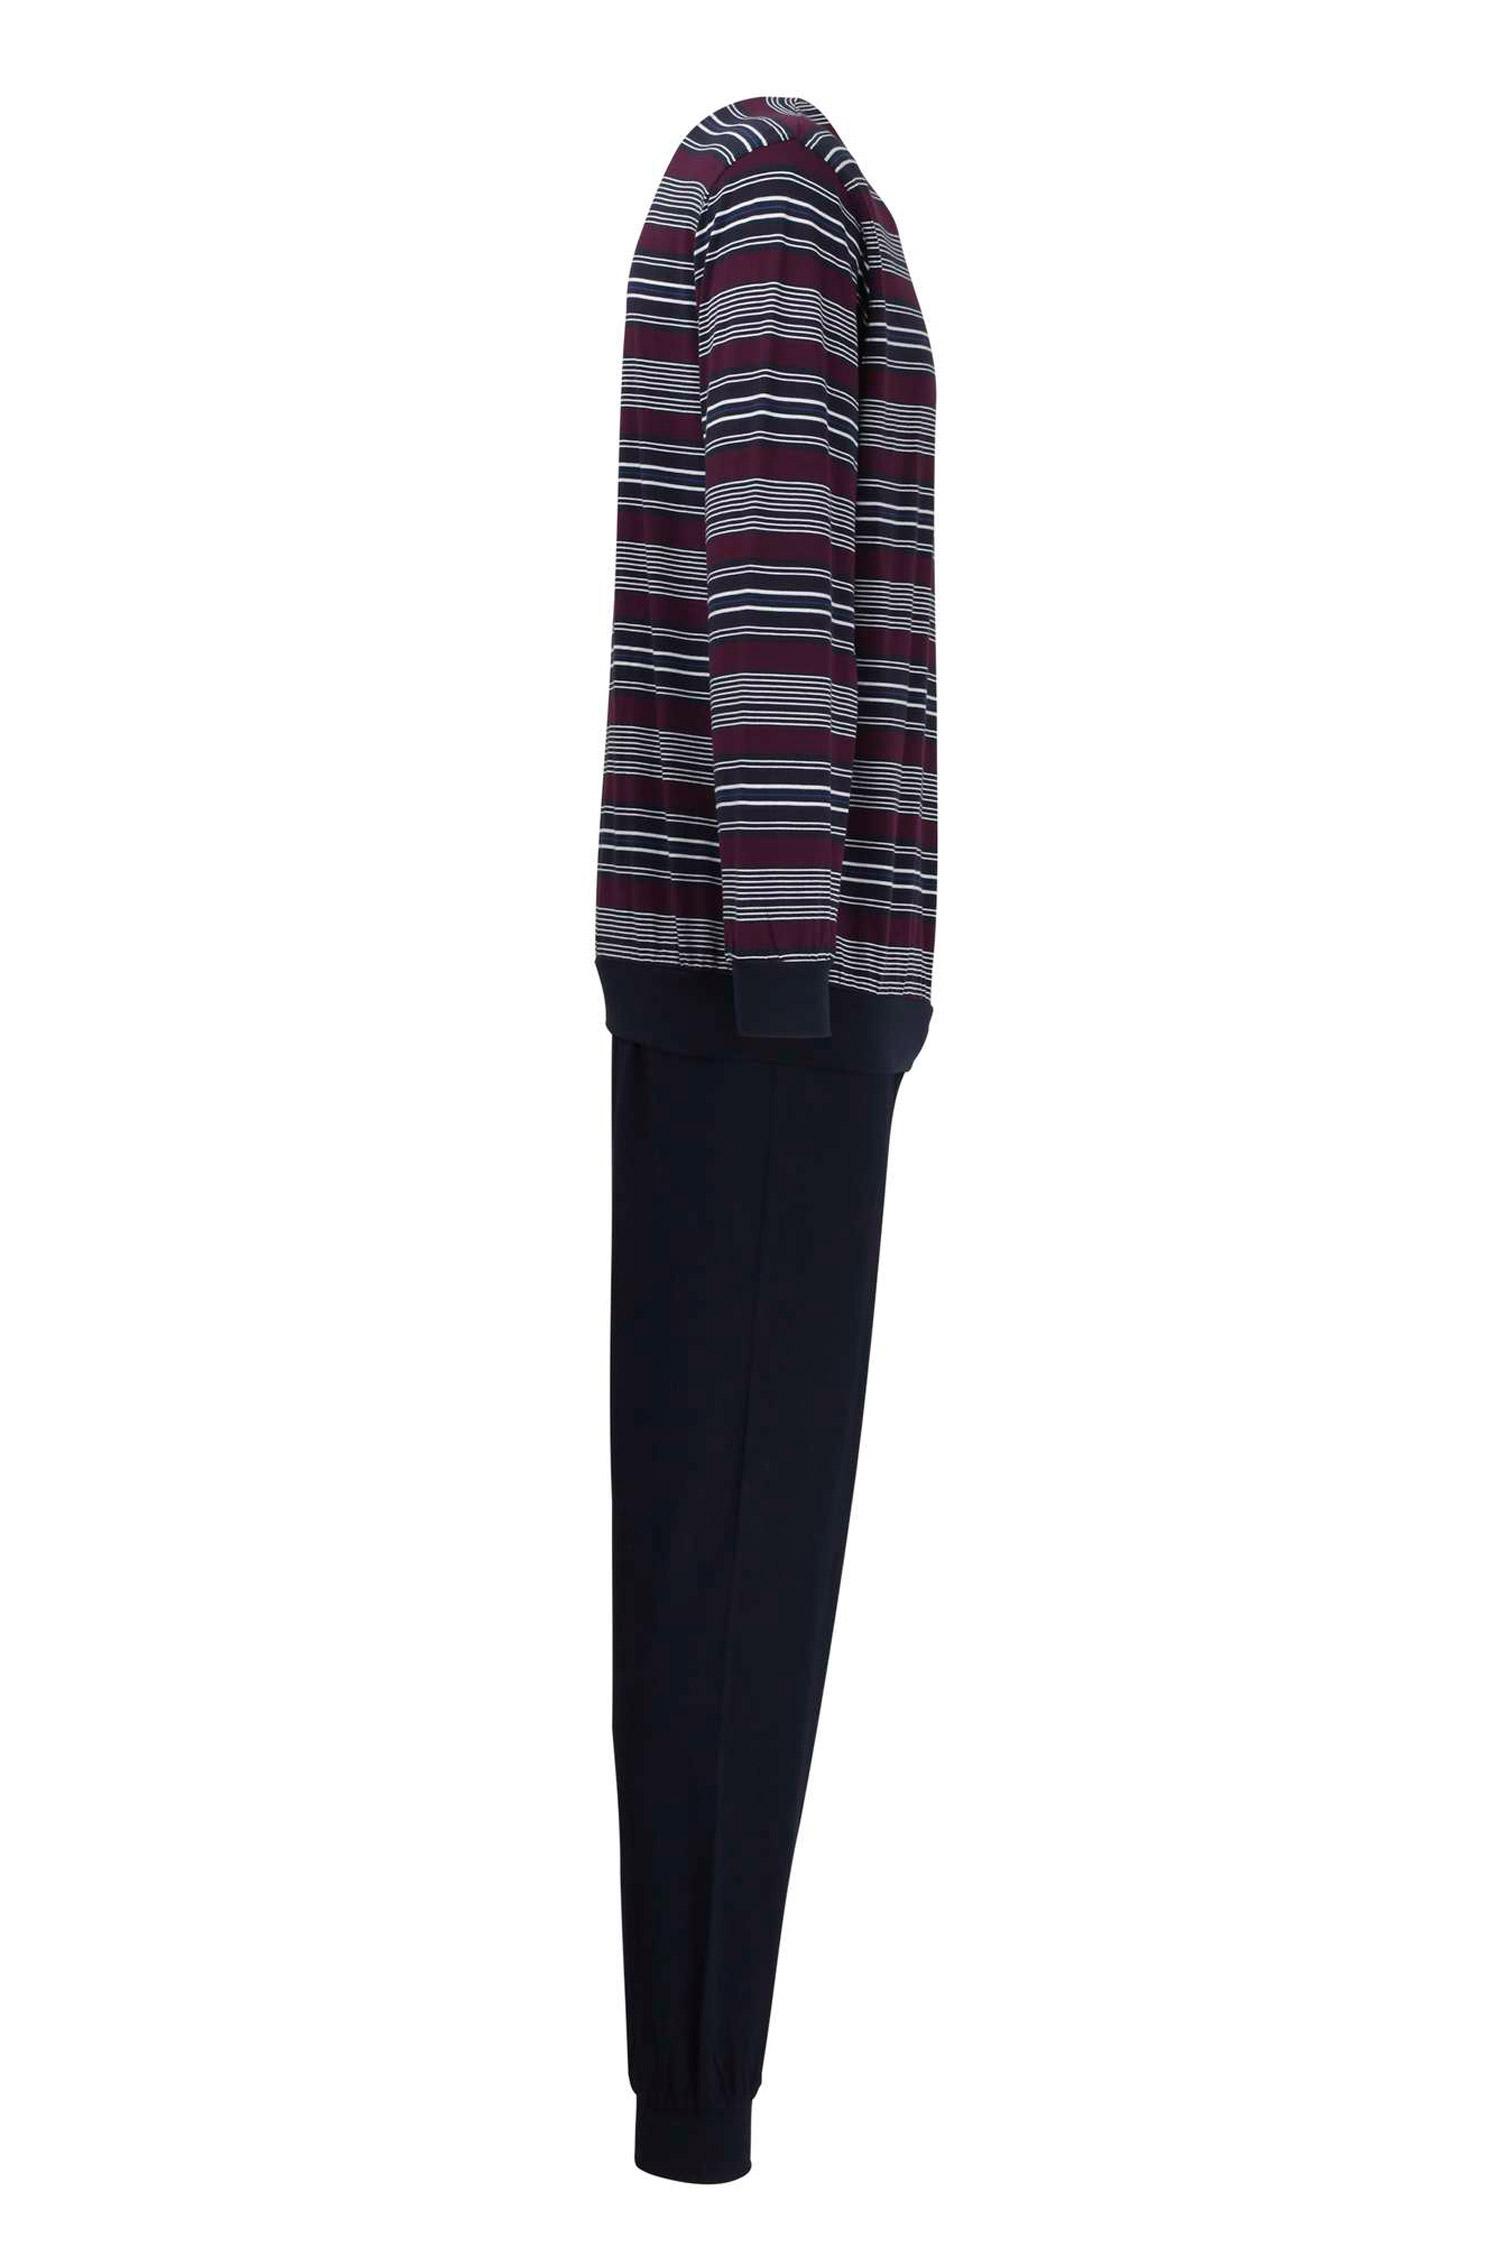 Homewear, Pijama M. Larga, 109881, BURDEOS | Zoom